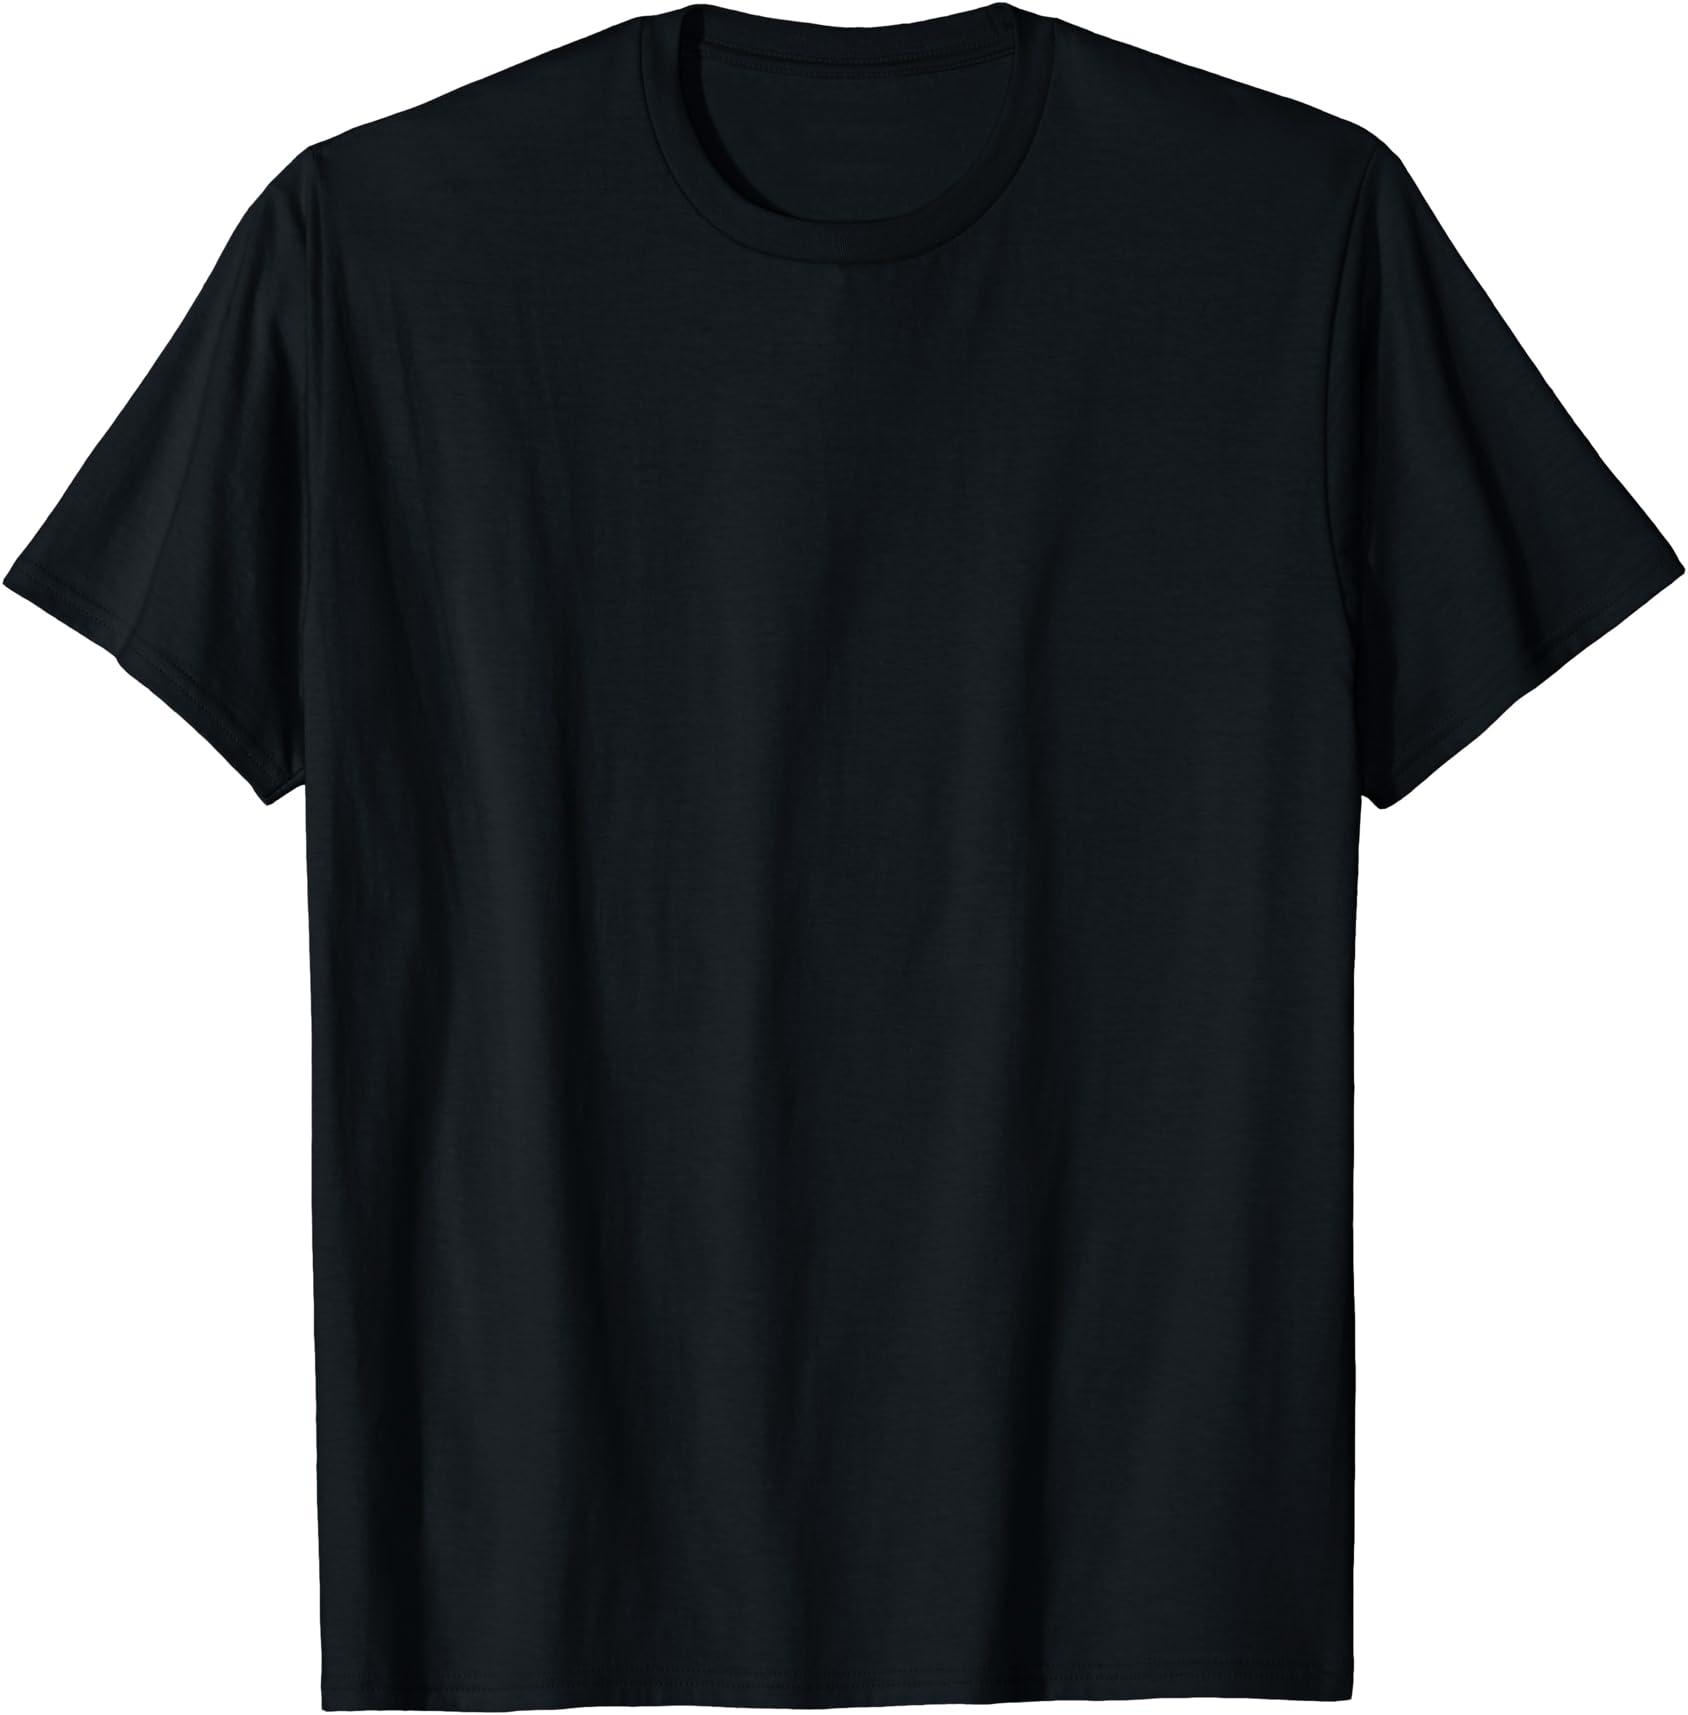 New McKenzie Boy's Maddox T-Shirt Grey